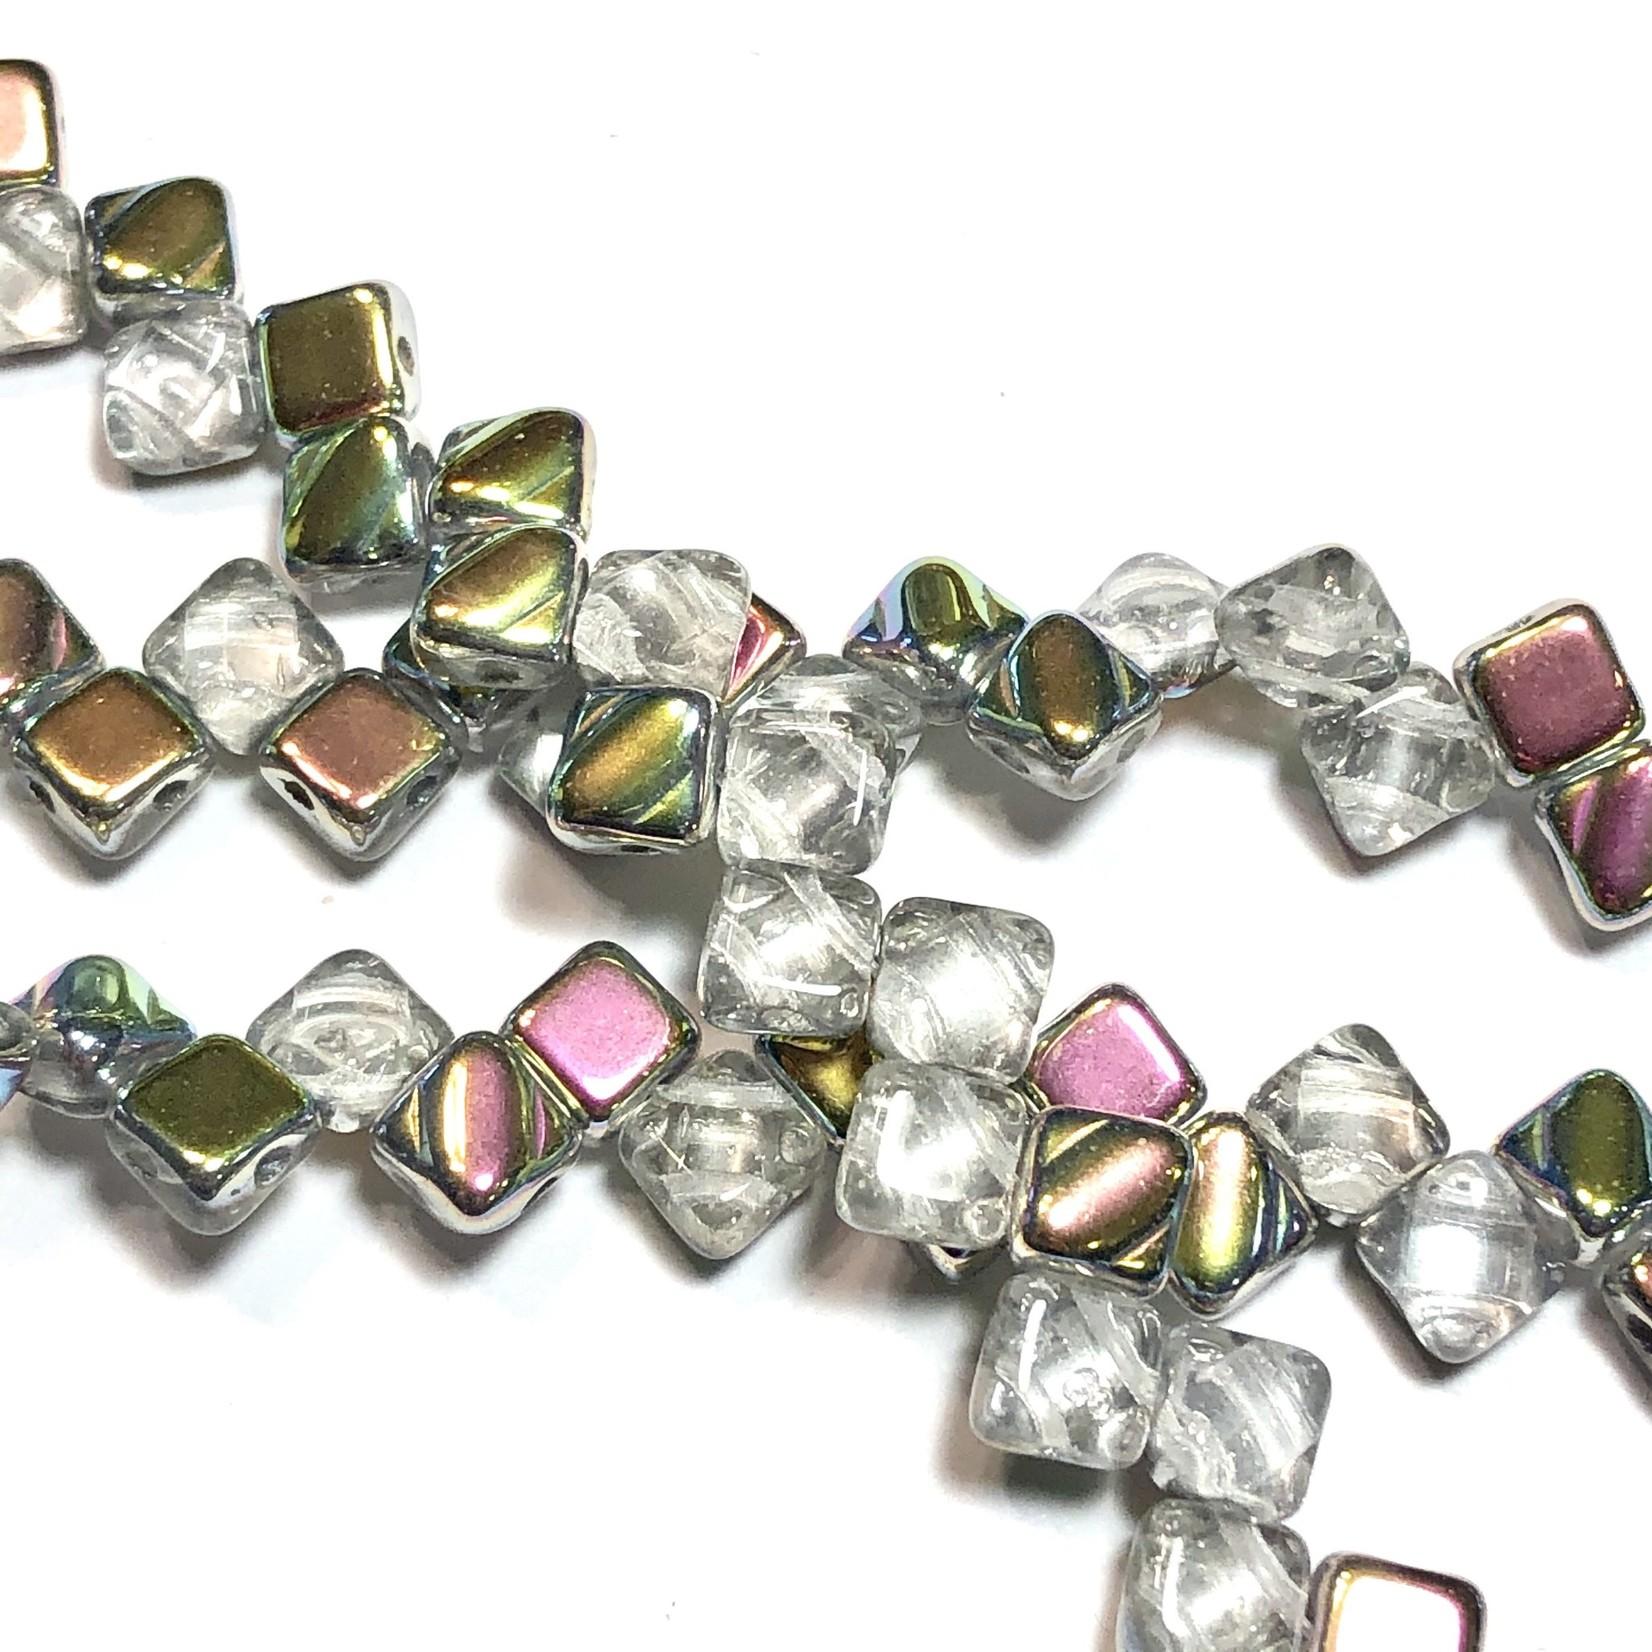 2-Hole SILKY Bead Crystal Vitrail 40pcs 6.5mm